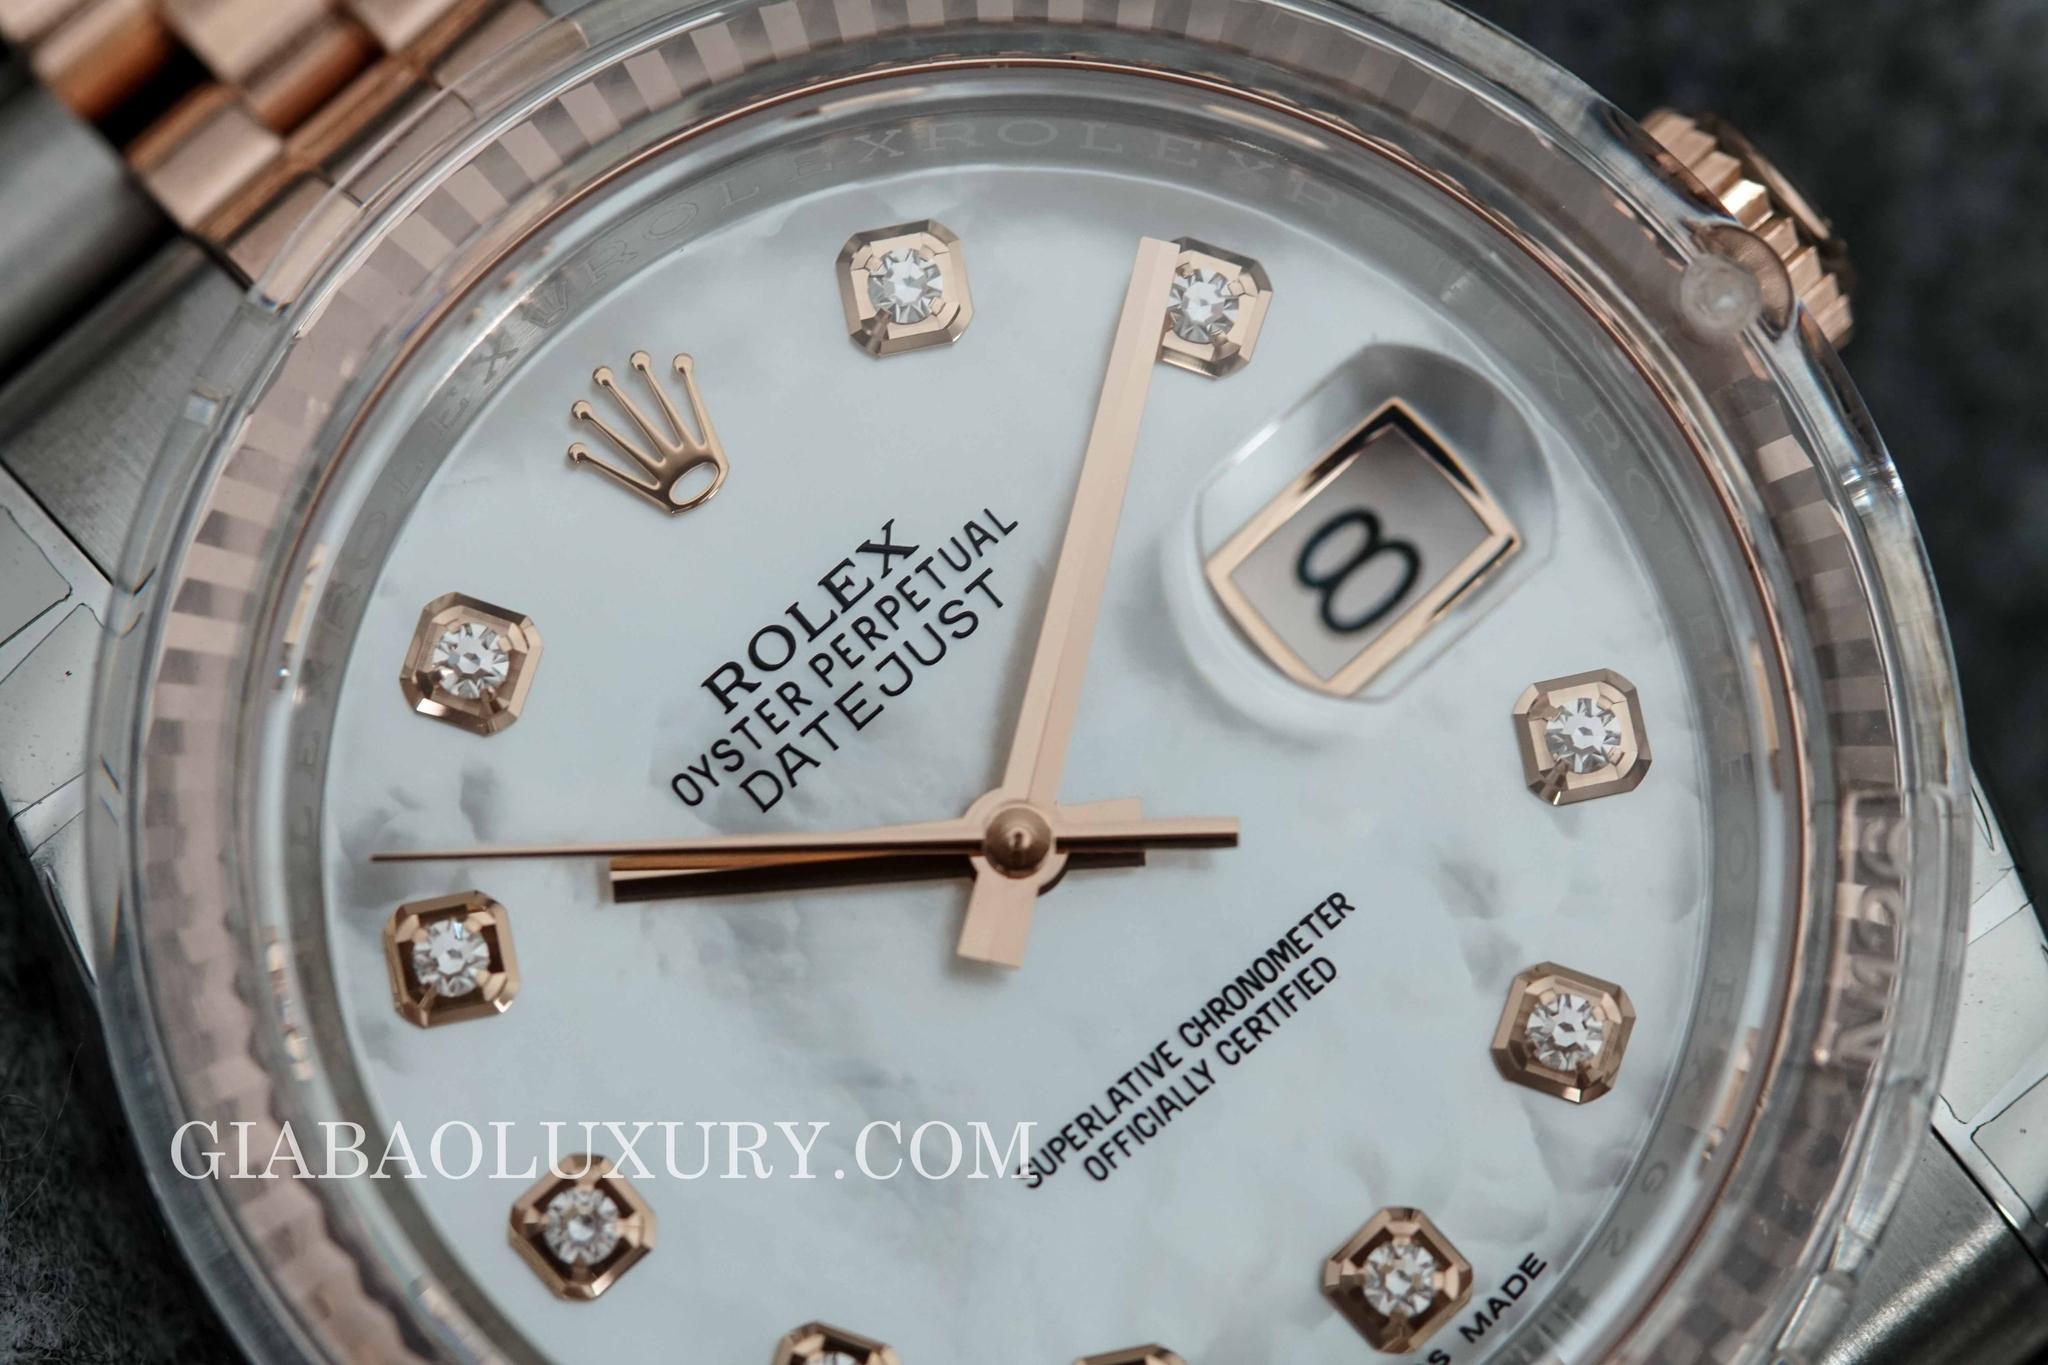 đồng hồ rolex datejust 116231